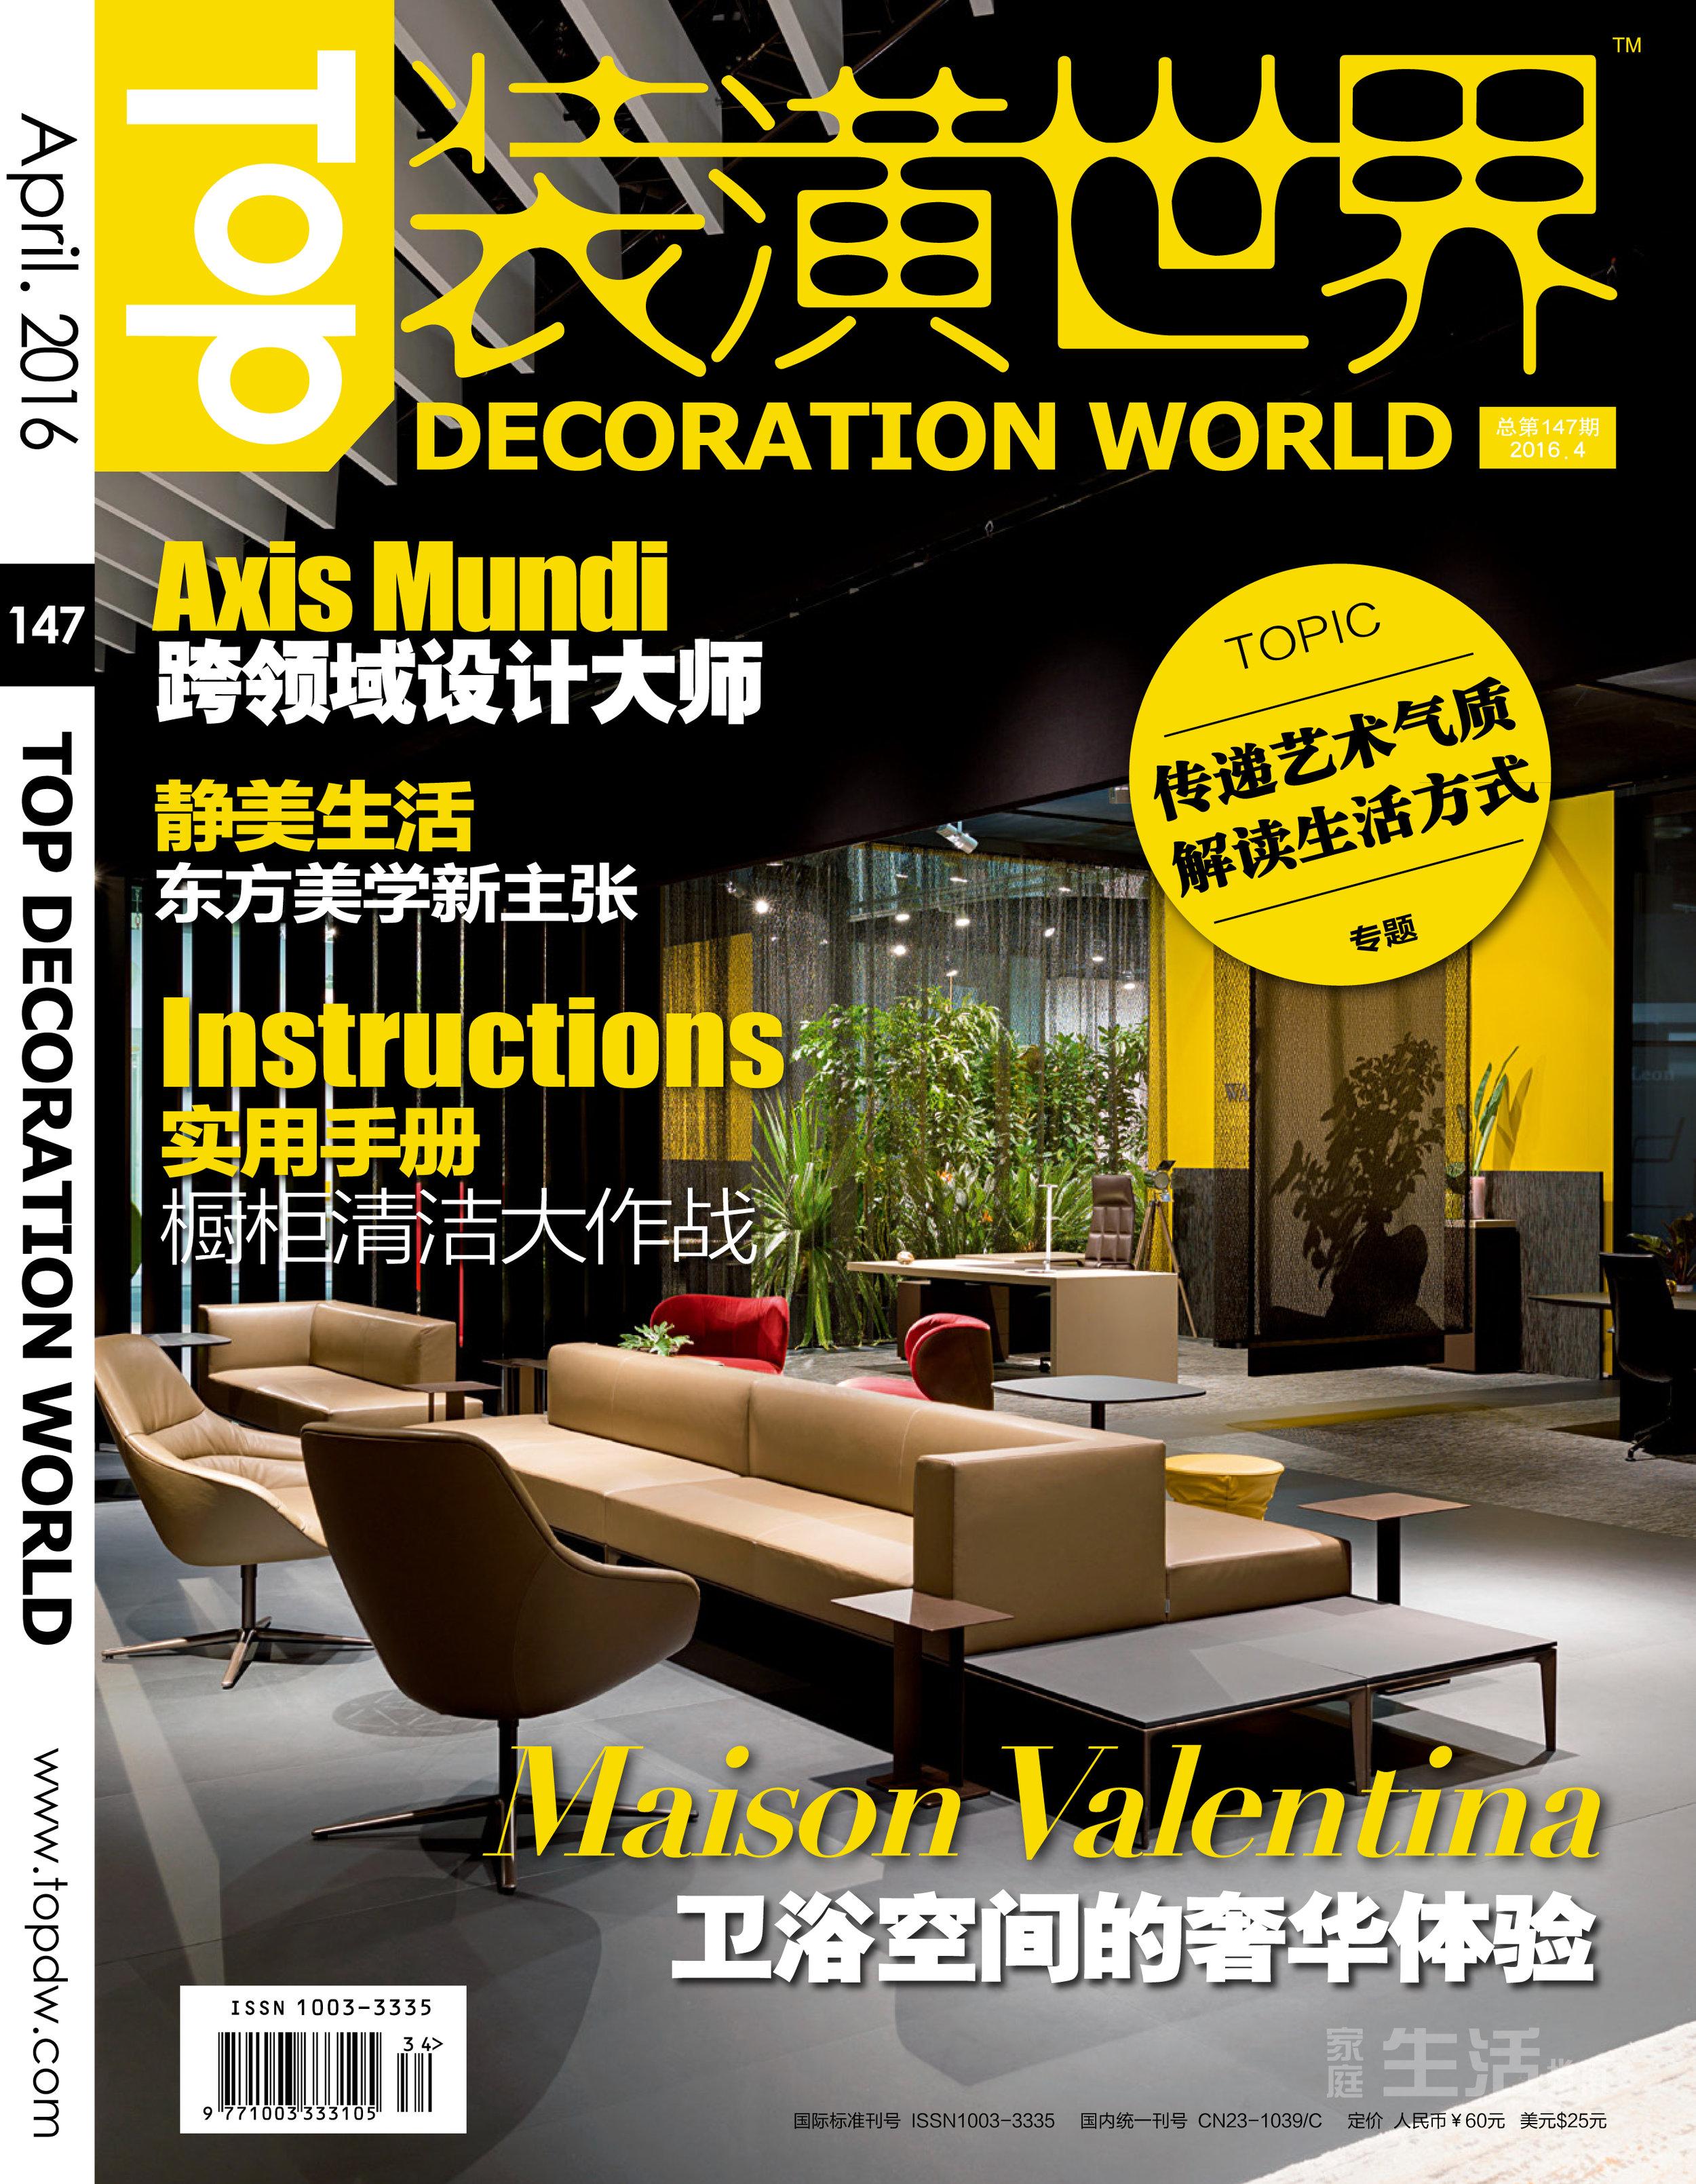 Decoration World.jpg